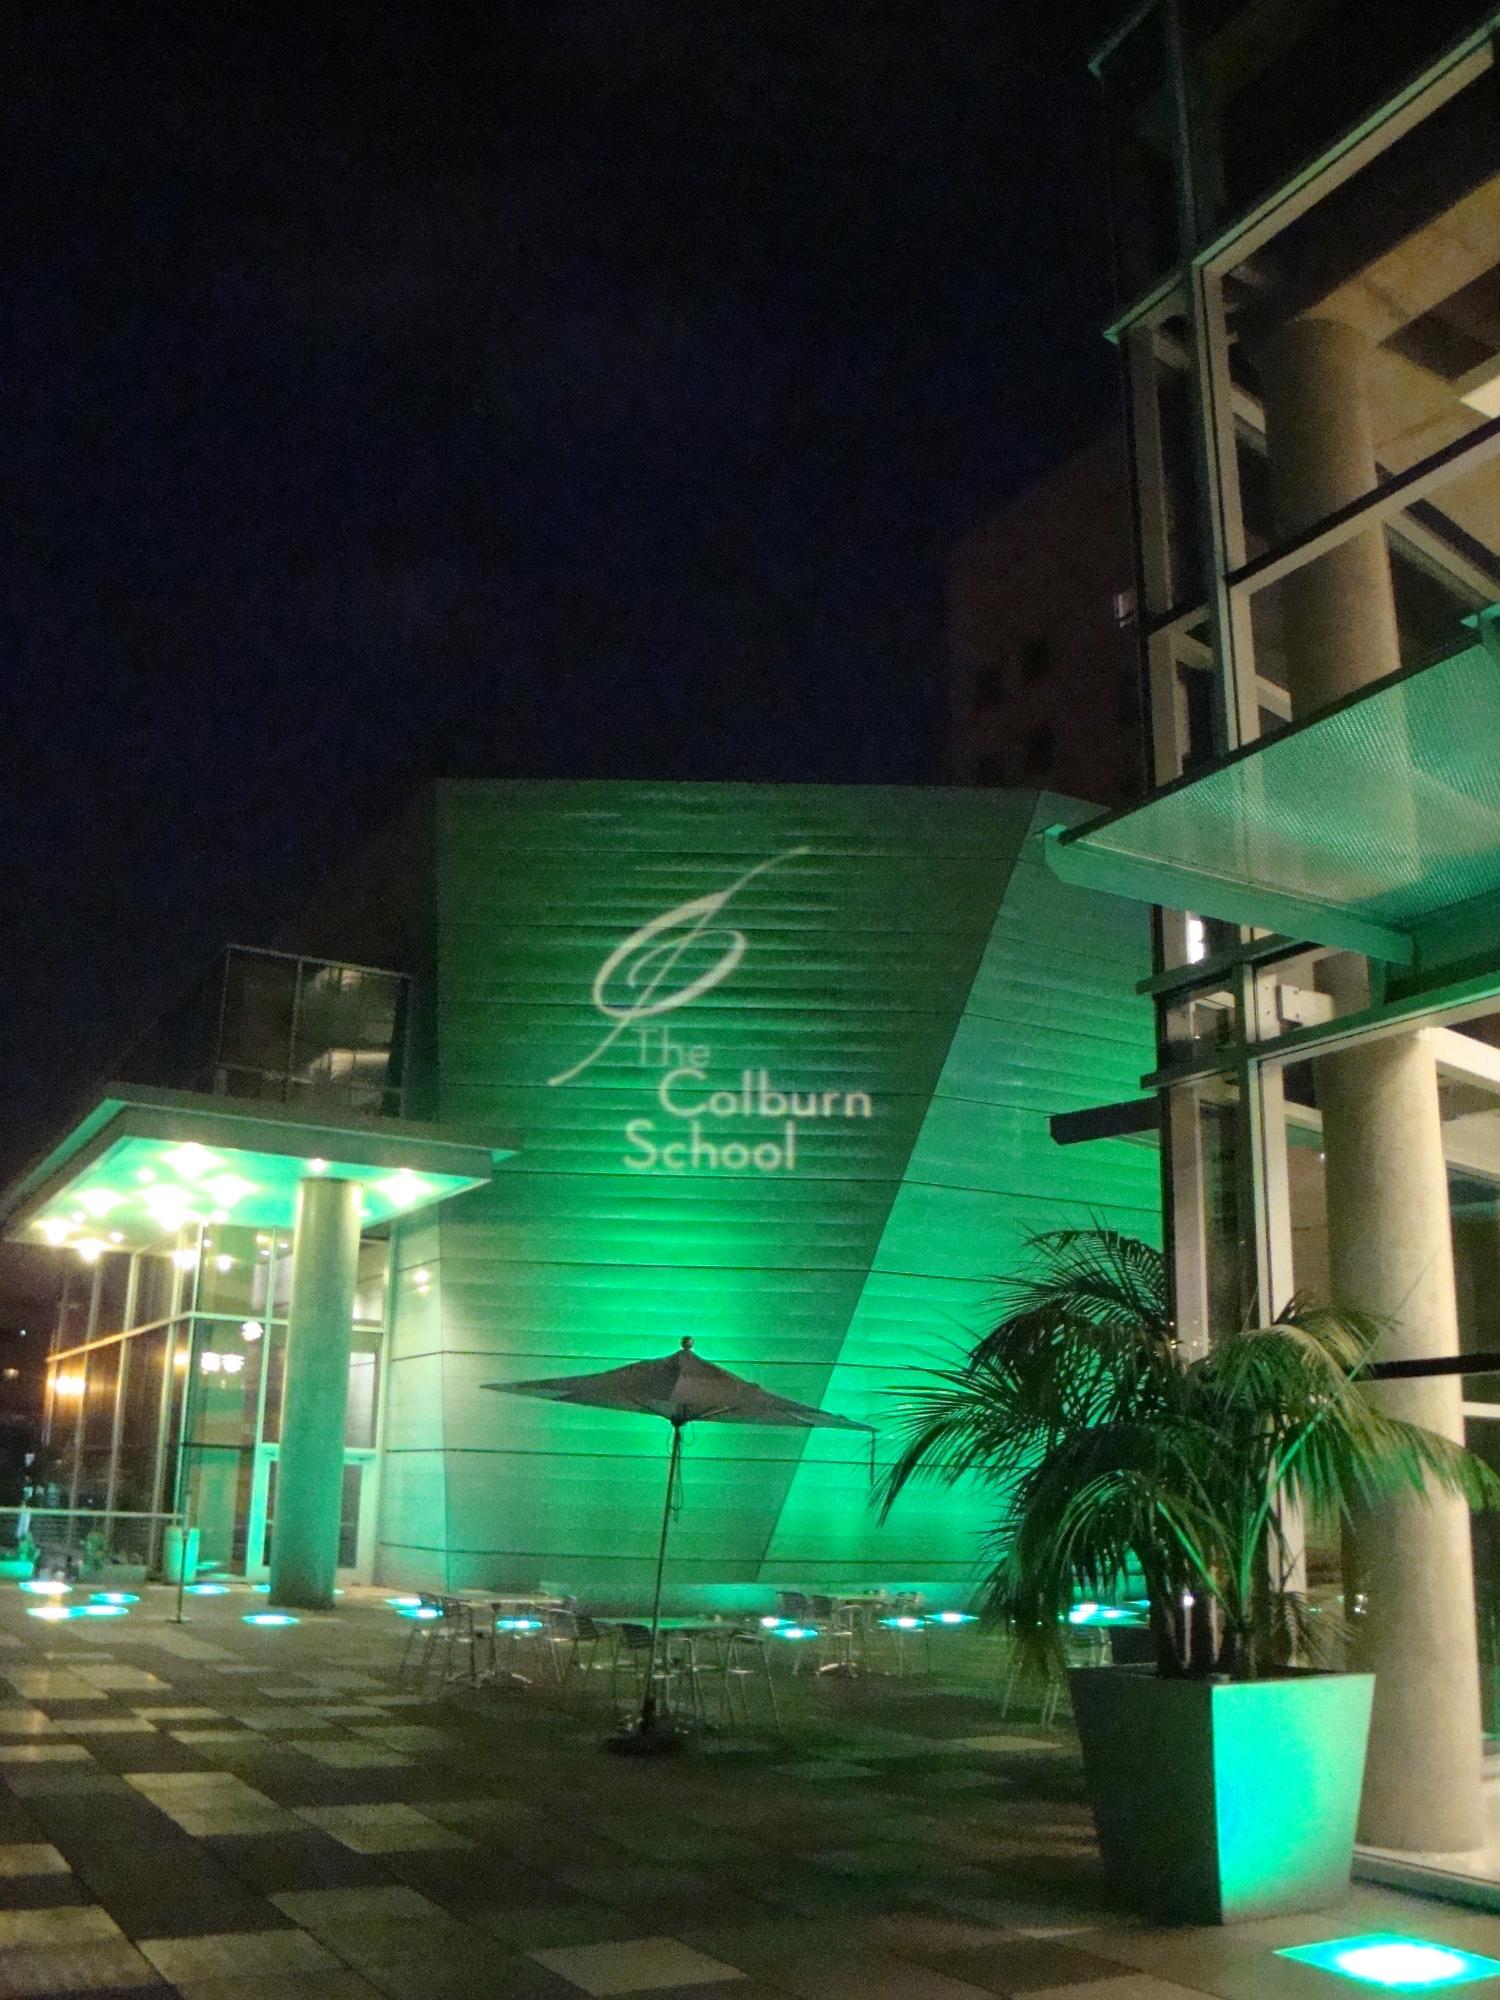 The Colburn School